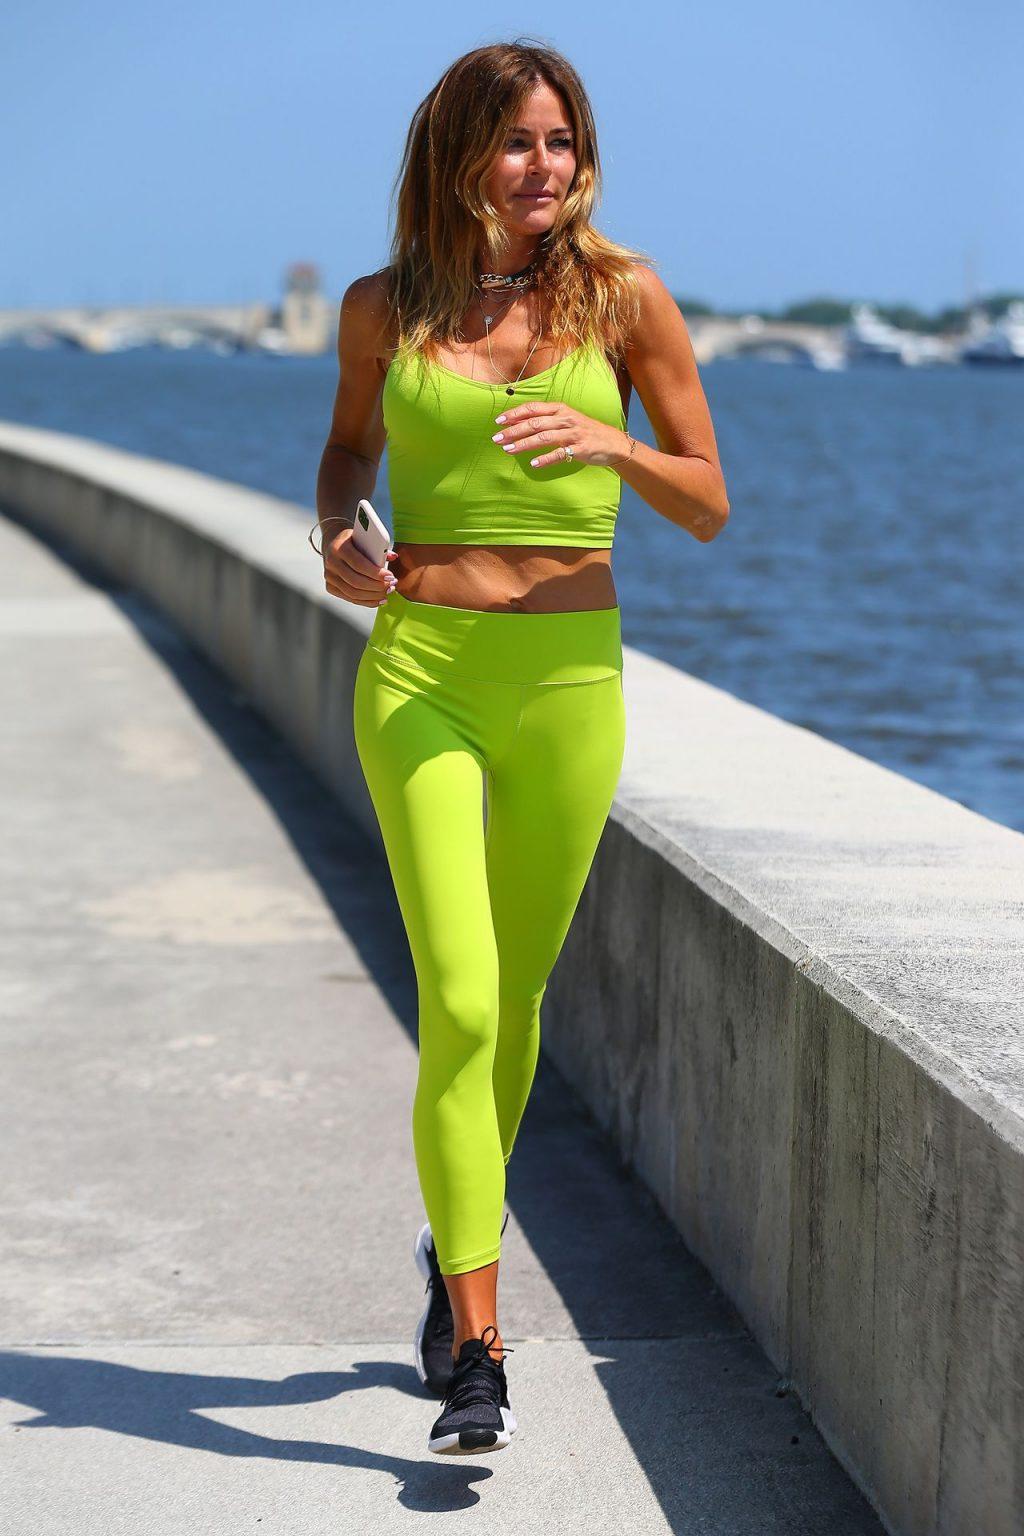 Kelly Bensimon Looks Hot in West Palm Beach (32 Photos)